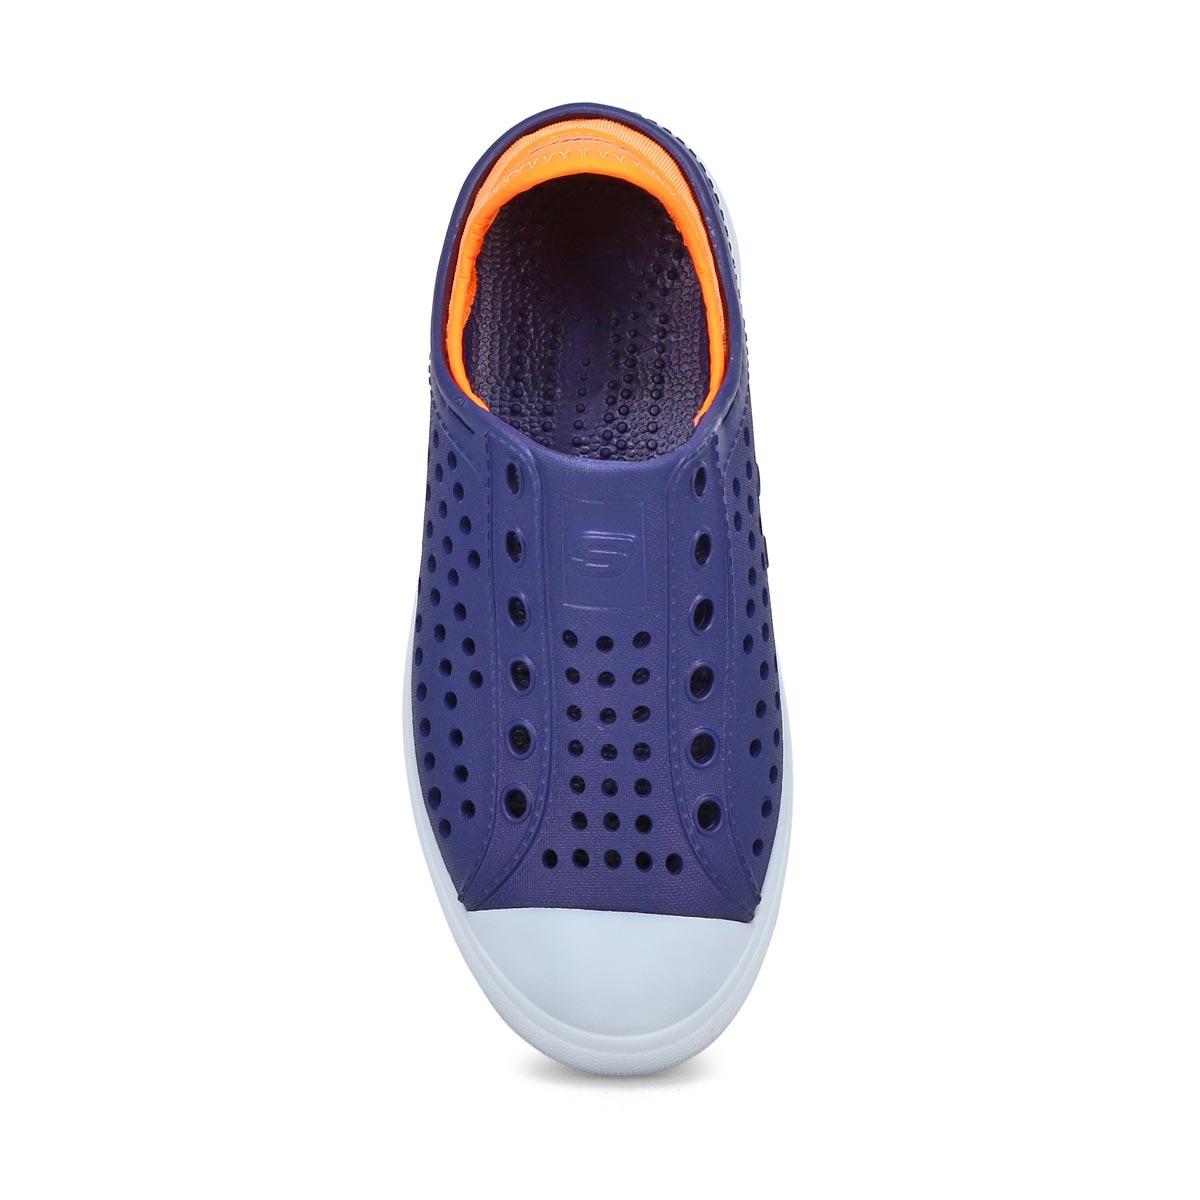 Boys' Guzman Flash Lighted Shoe - Navy/Orange